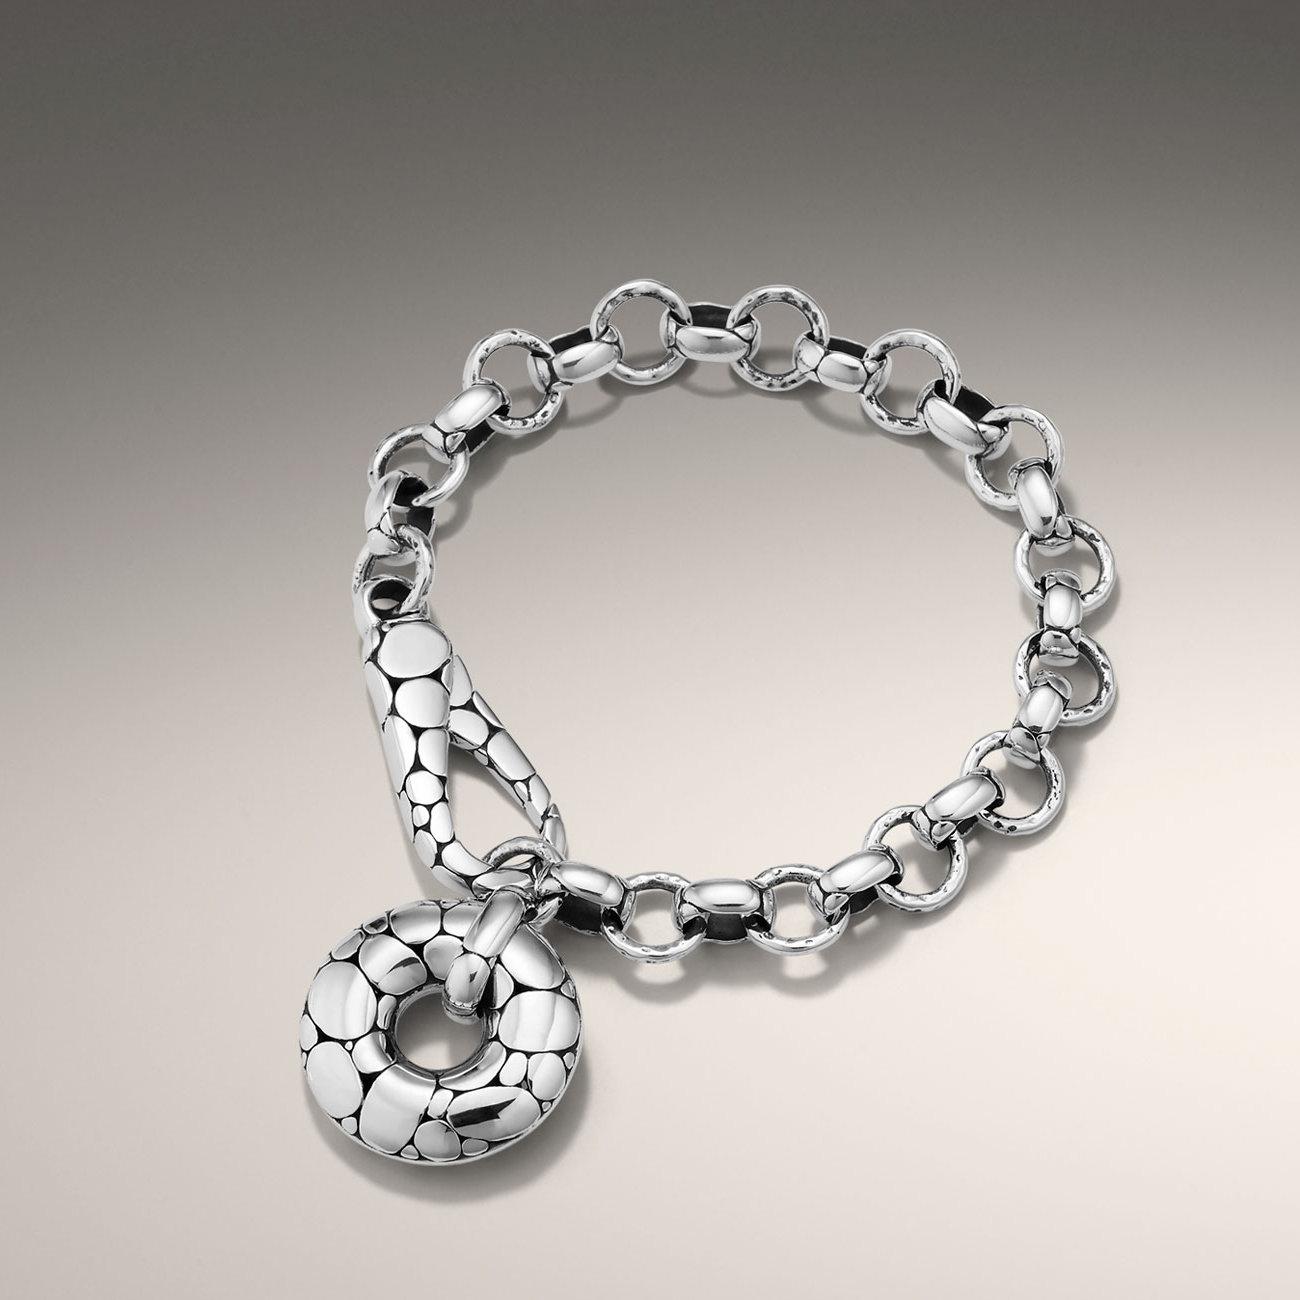 bc8efbb97e53 Lyst - John Hardy Link Bracelet with Doughnut Clasp in Metallic